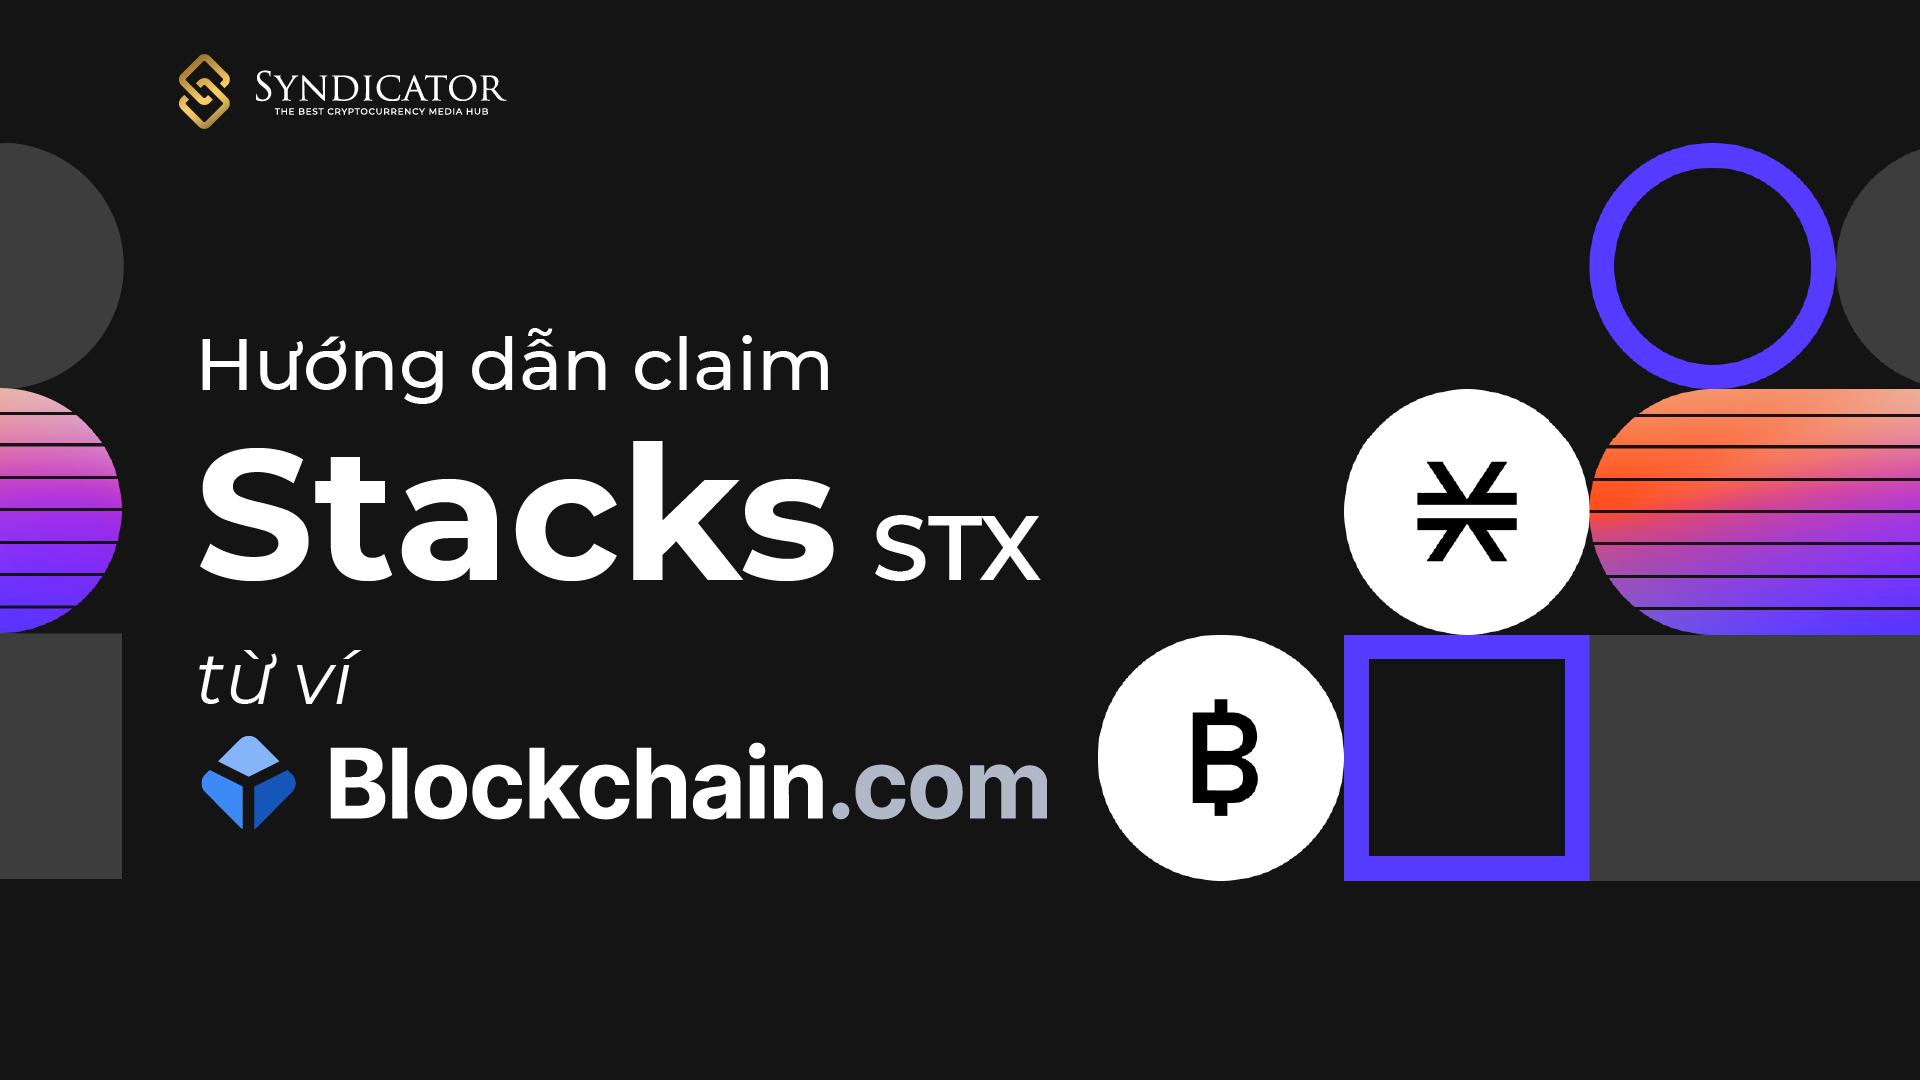 Hướng dẫn Claim Blockstack (STX) từ ví Blockchain.com - hiro wallet - backup phrase - syndicator